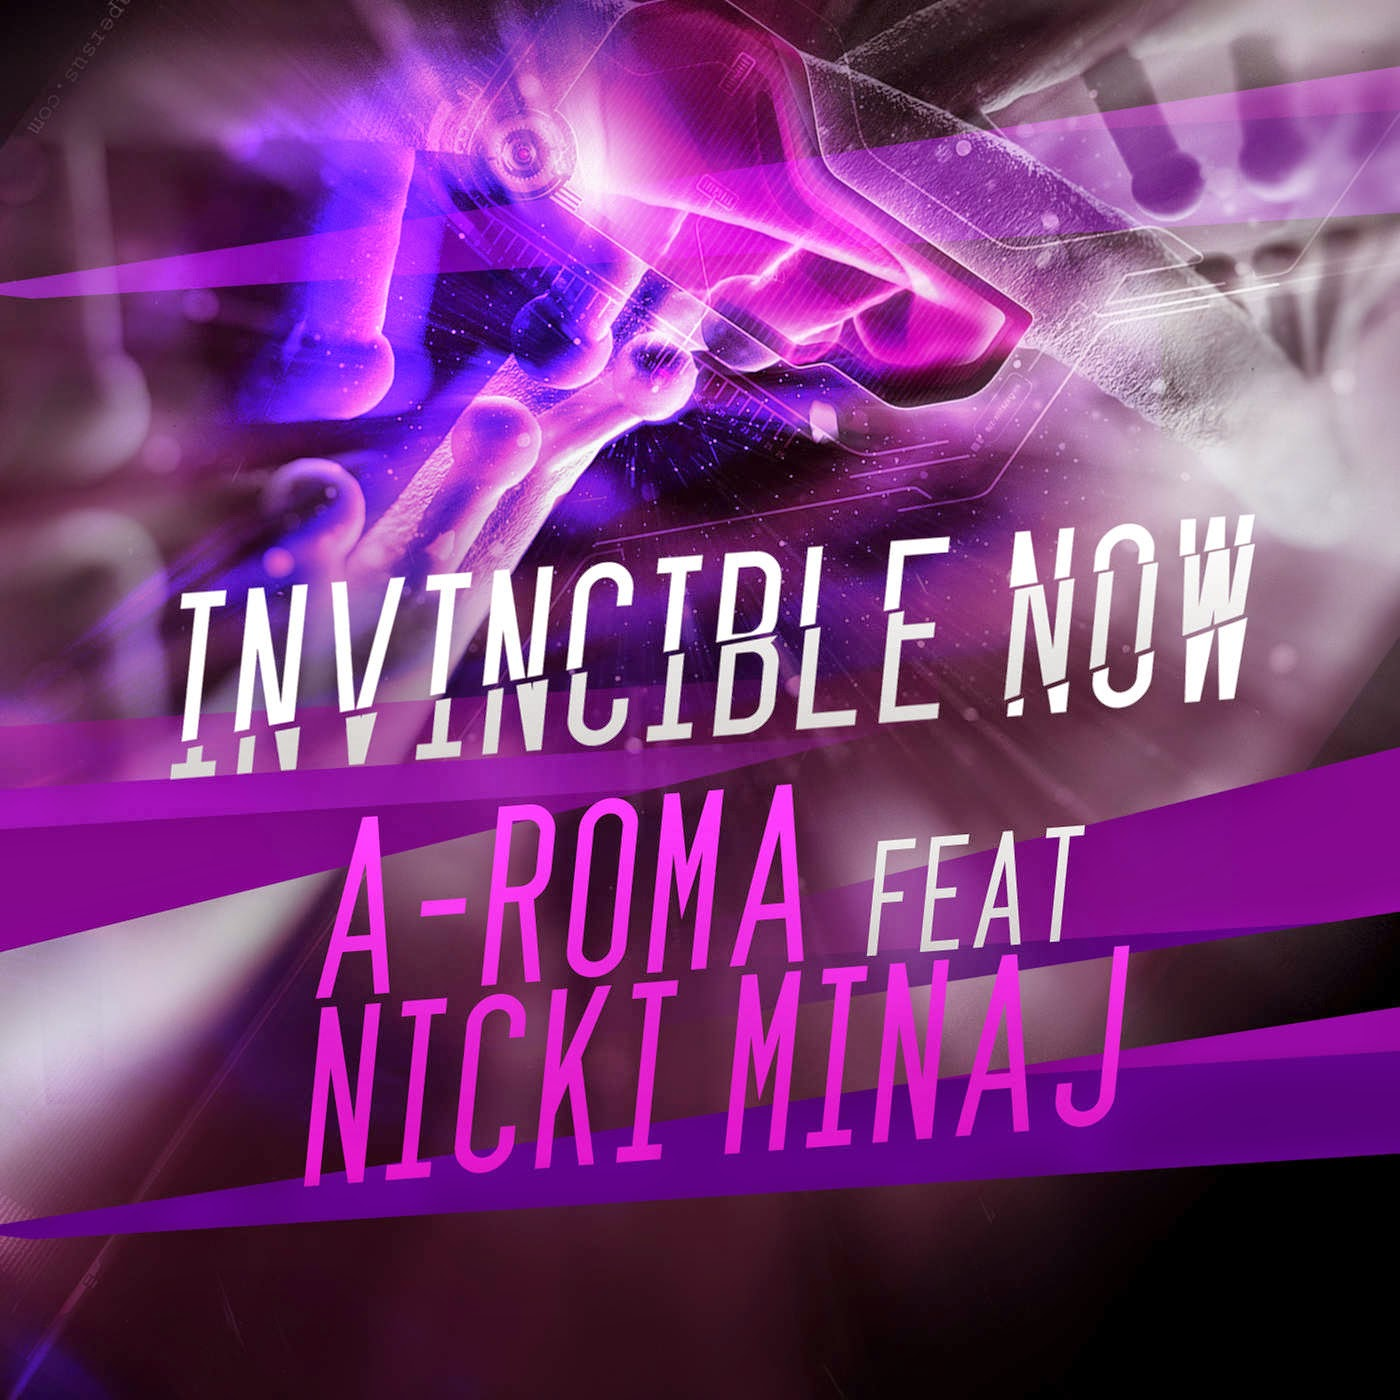 Aroma - Invincible Now (feat. Nicki Minaj & Shawn Lewsi) - Single Cover